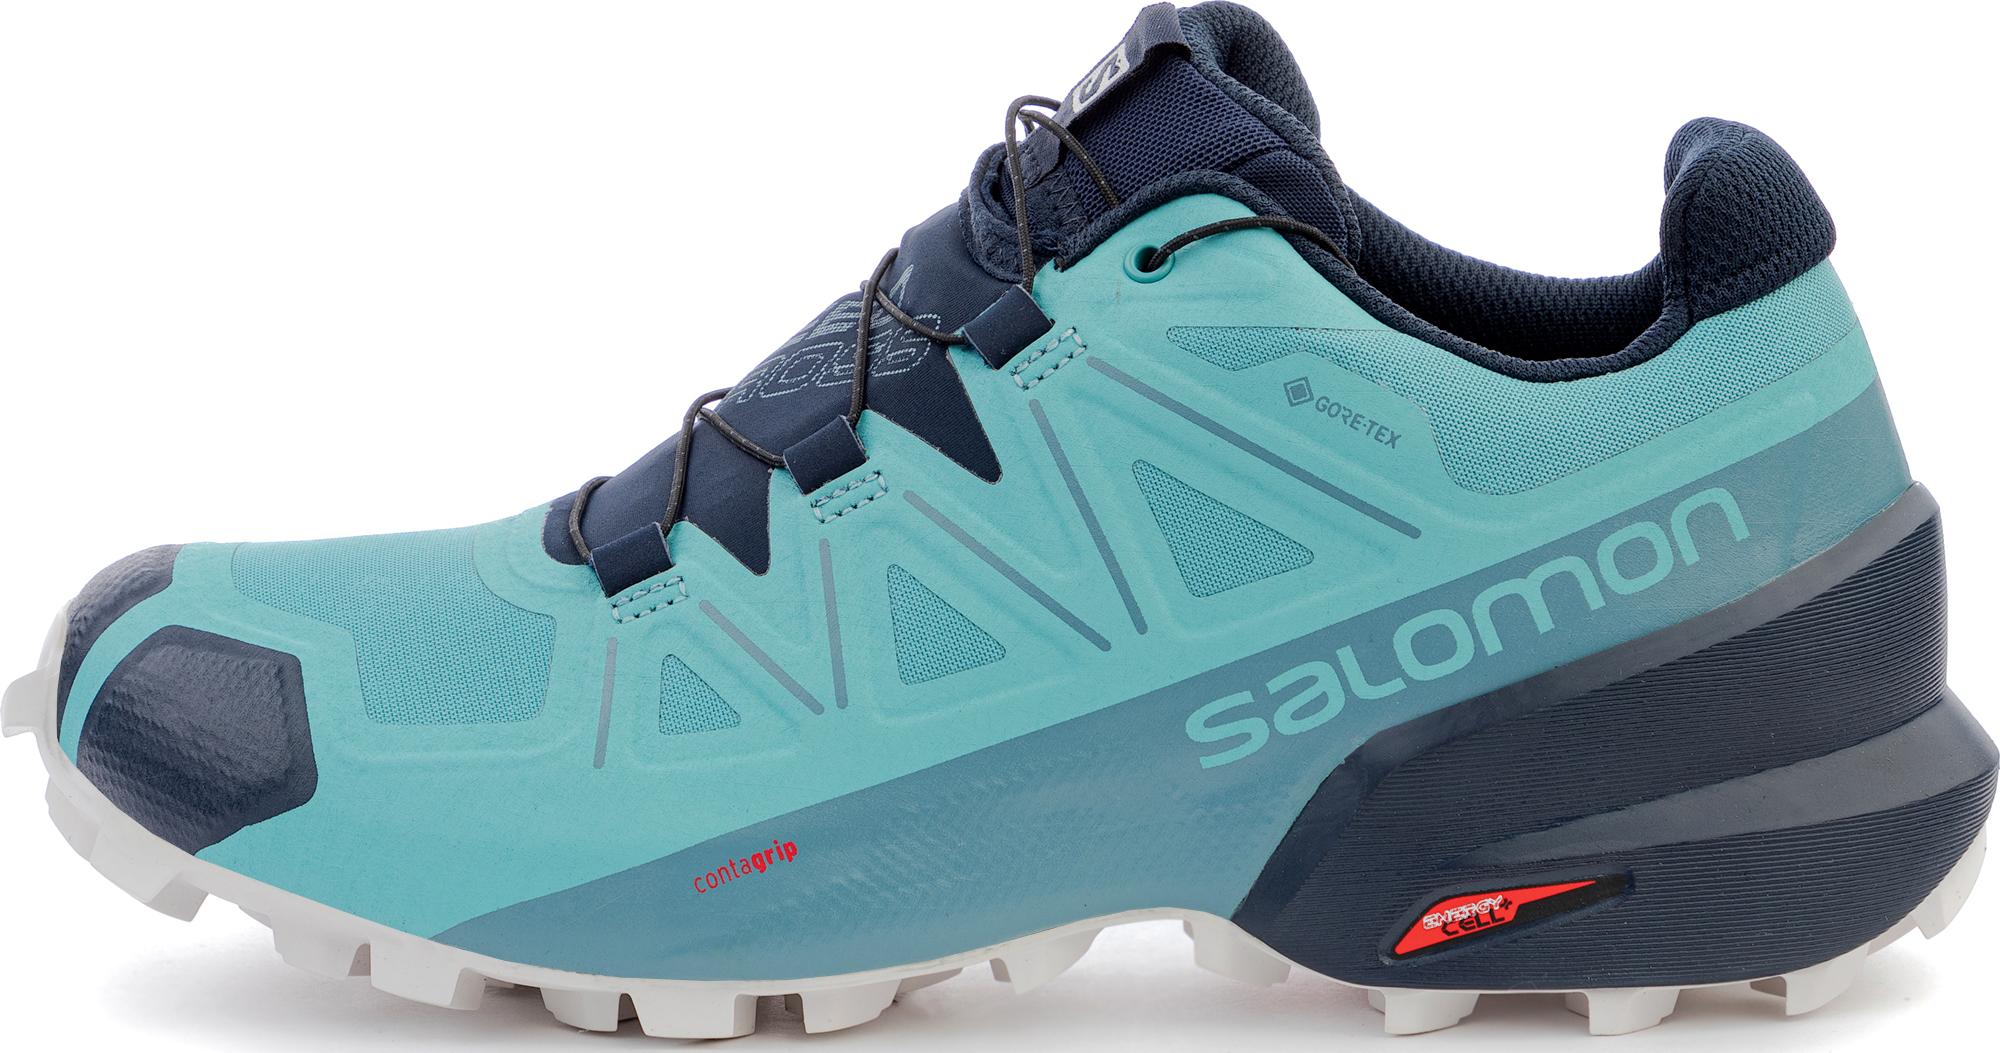 Salomon Кроссовки женские Salomon Speedcross 5, размер 40